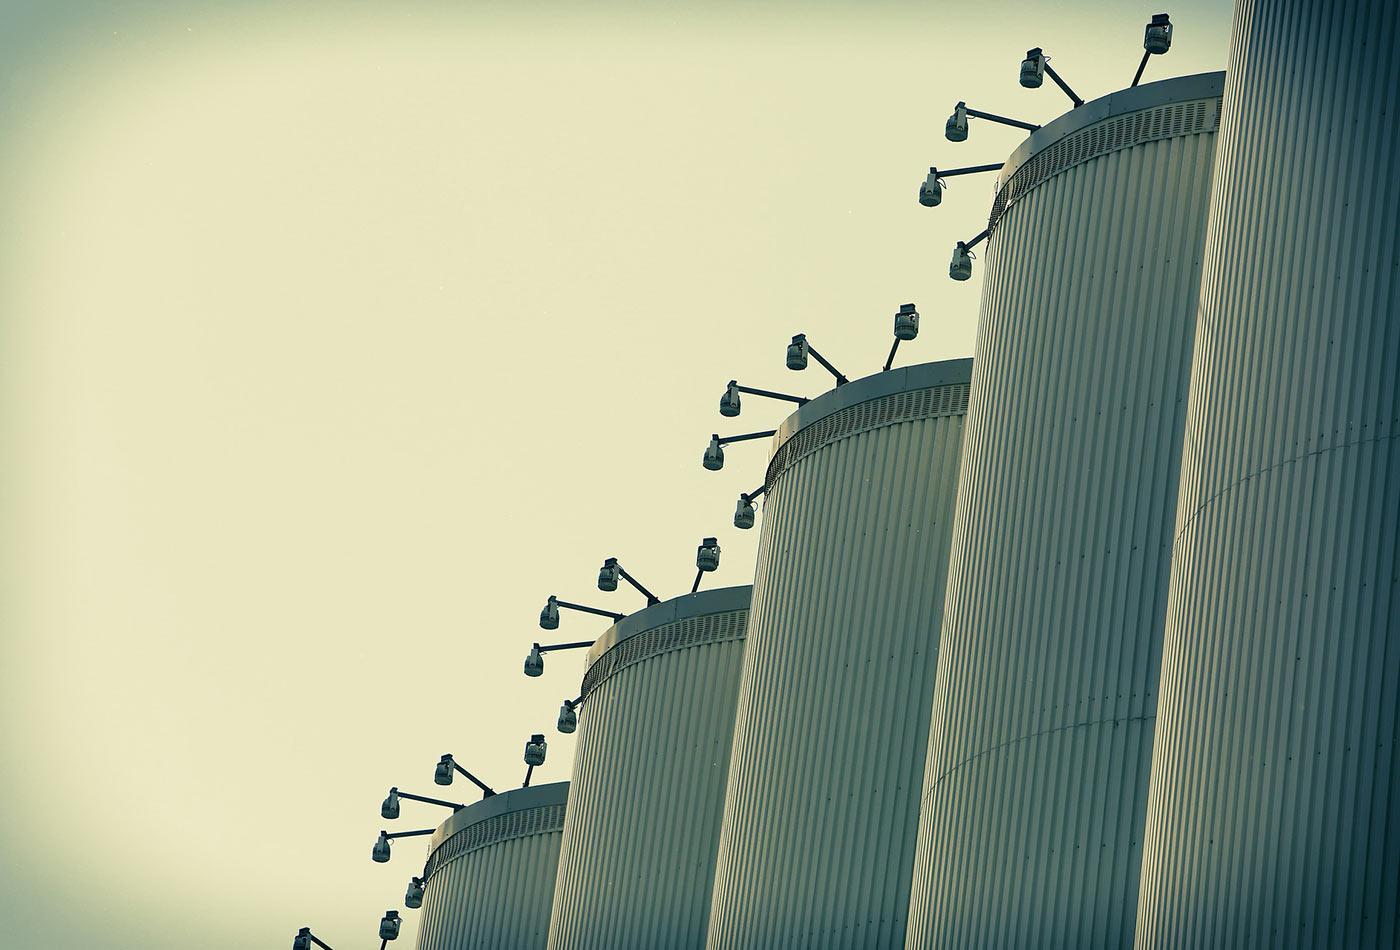 Storage silos.